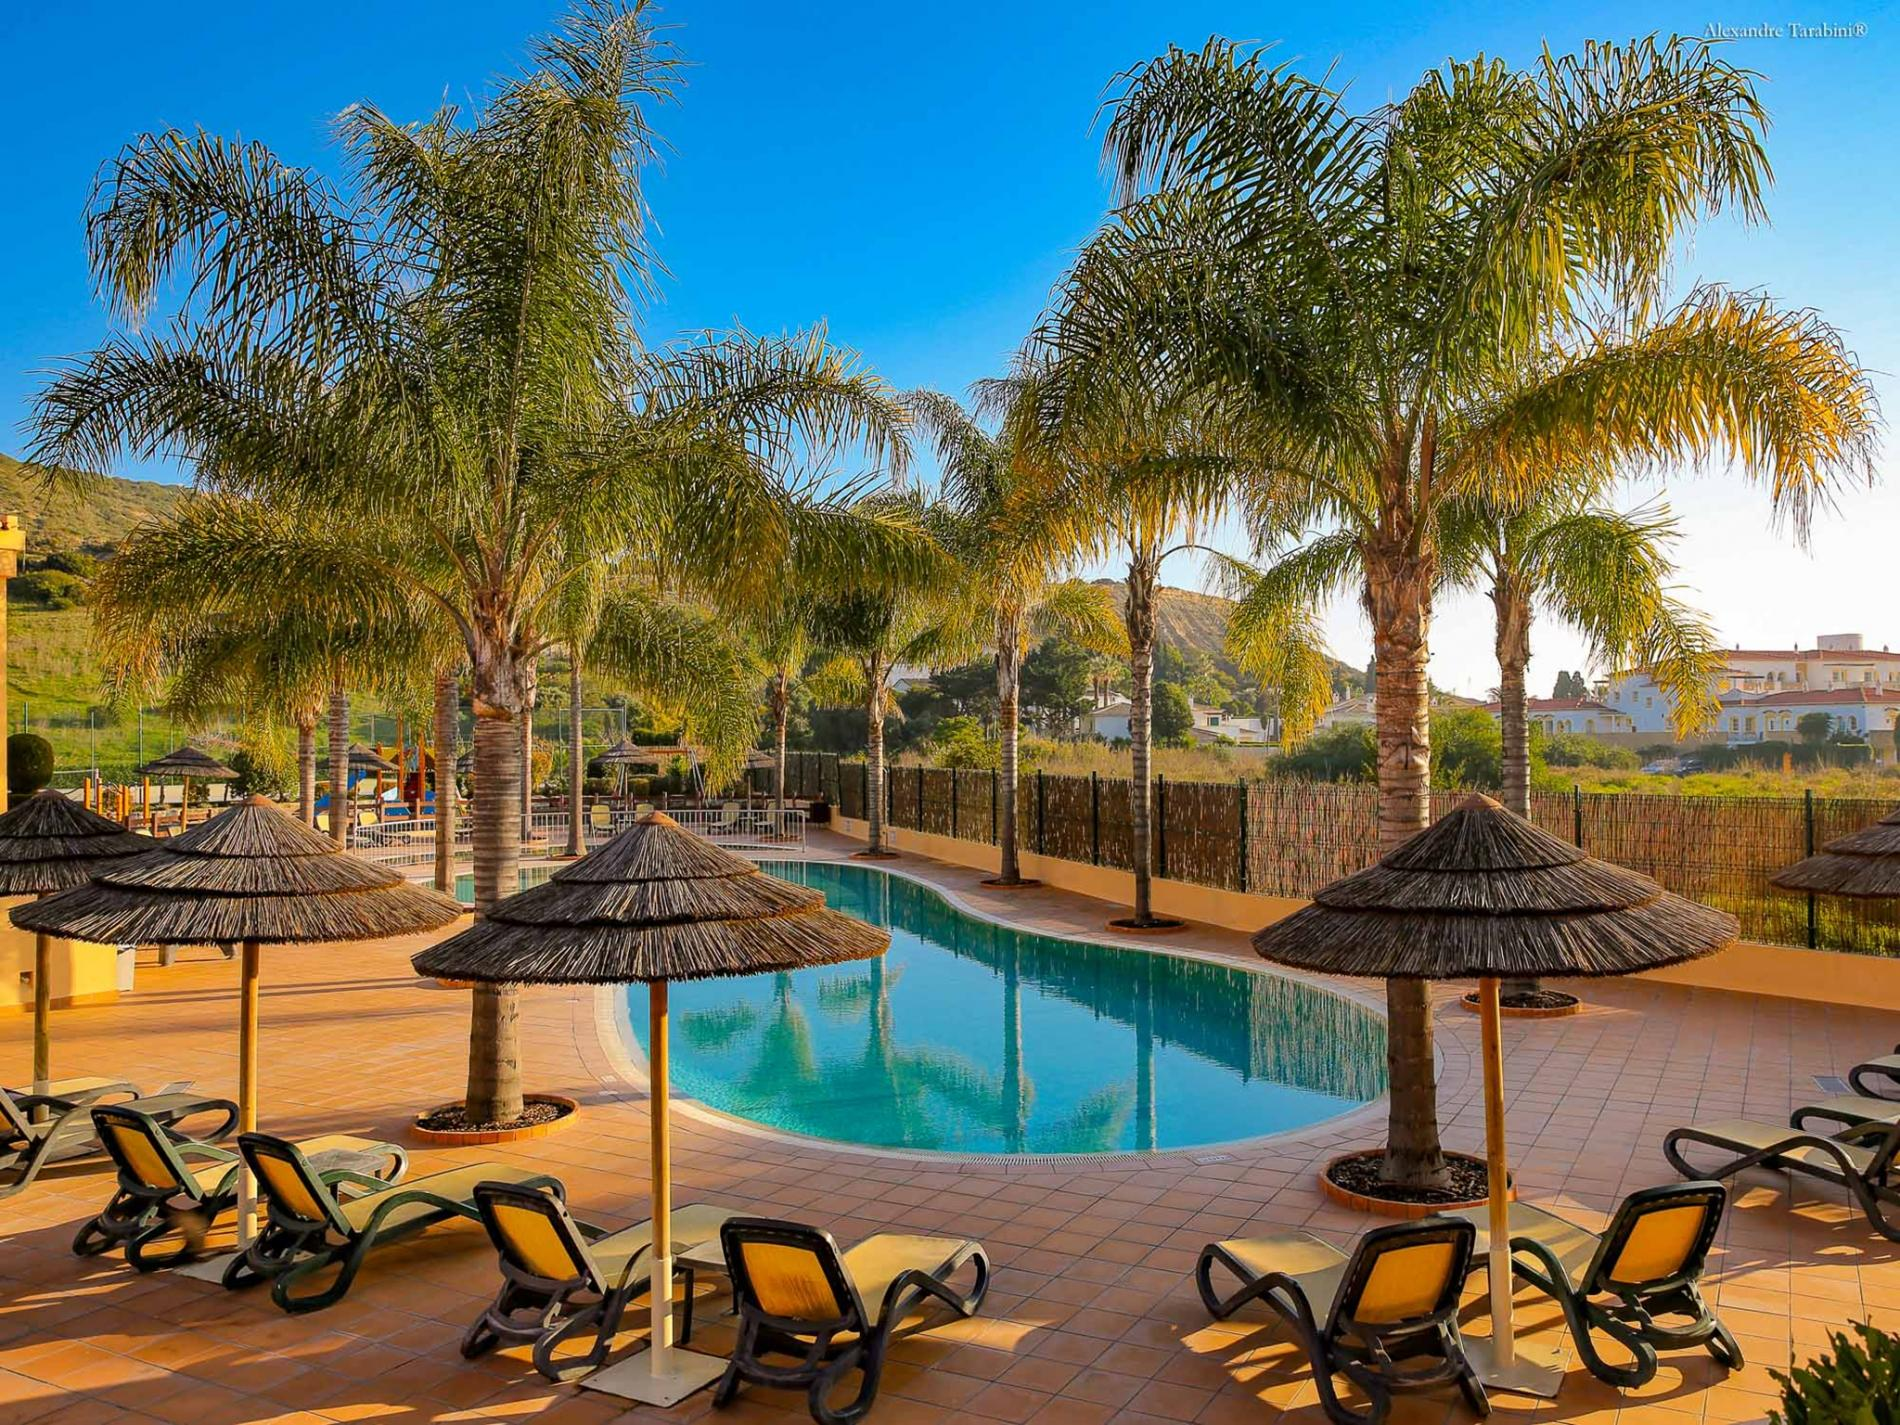 Ferienwohnung A24 - LuzBay Beach Apartment (2558091), Luz, , Algarve, Portugal, Bild 23